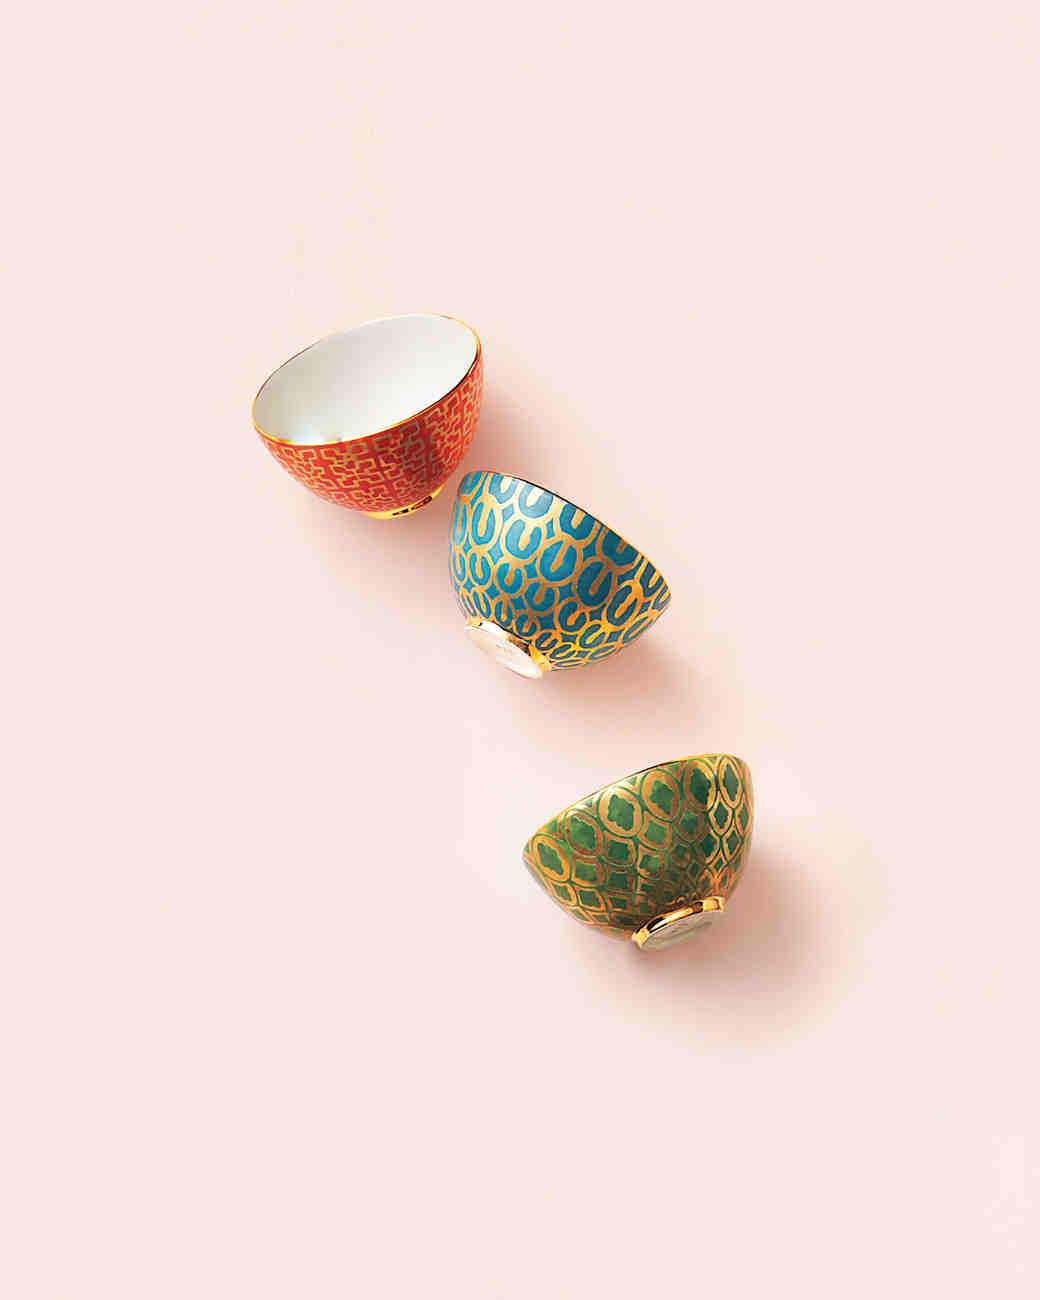 claire-pettibone-bowls-mwd108878.jpg